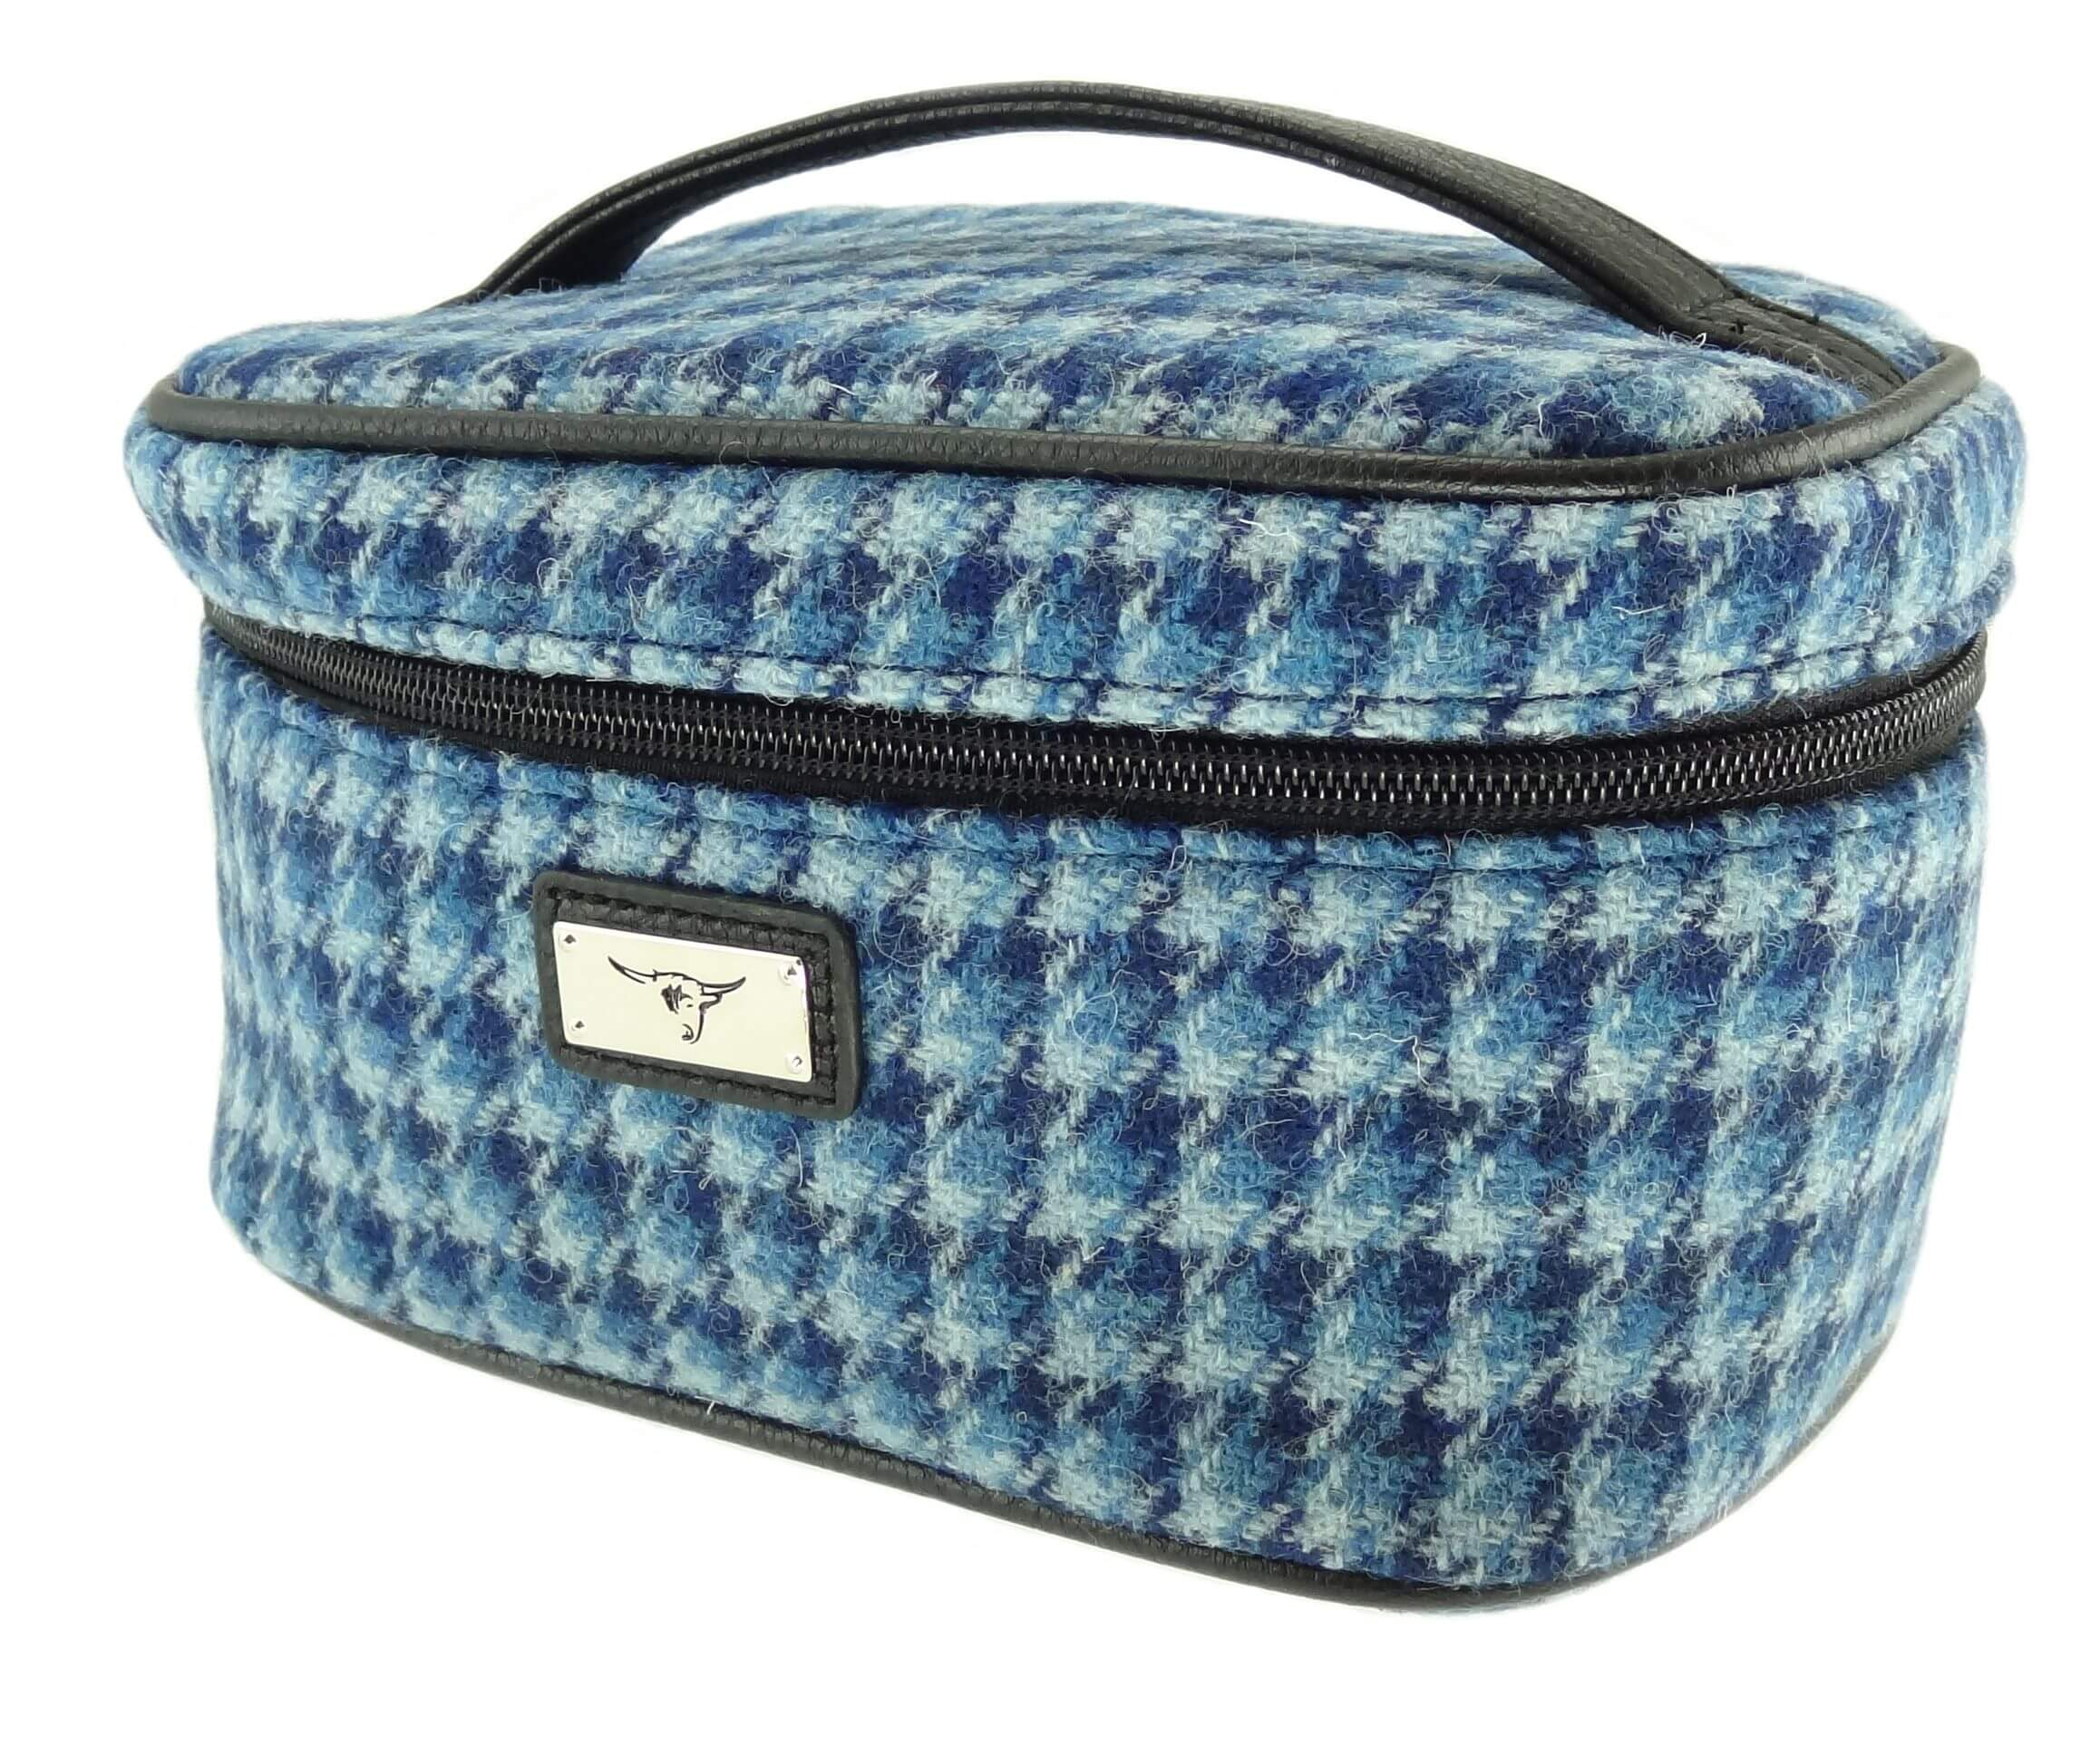 Harris Tweed Cosmetic Bag LB2103-COL63